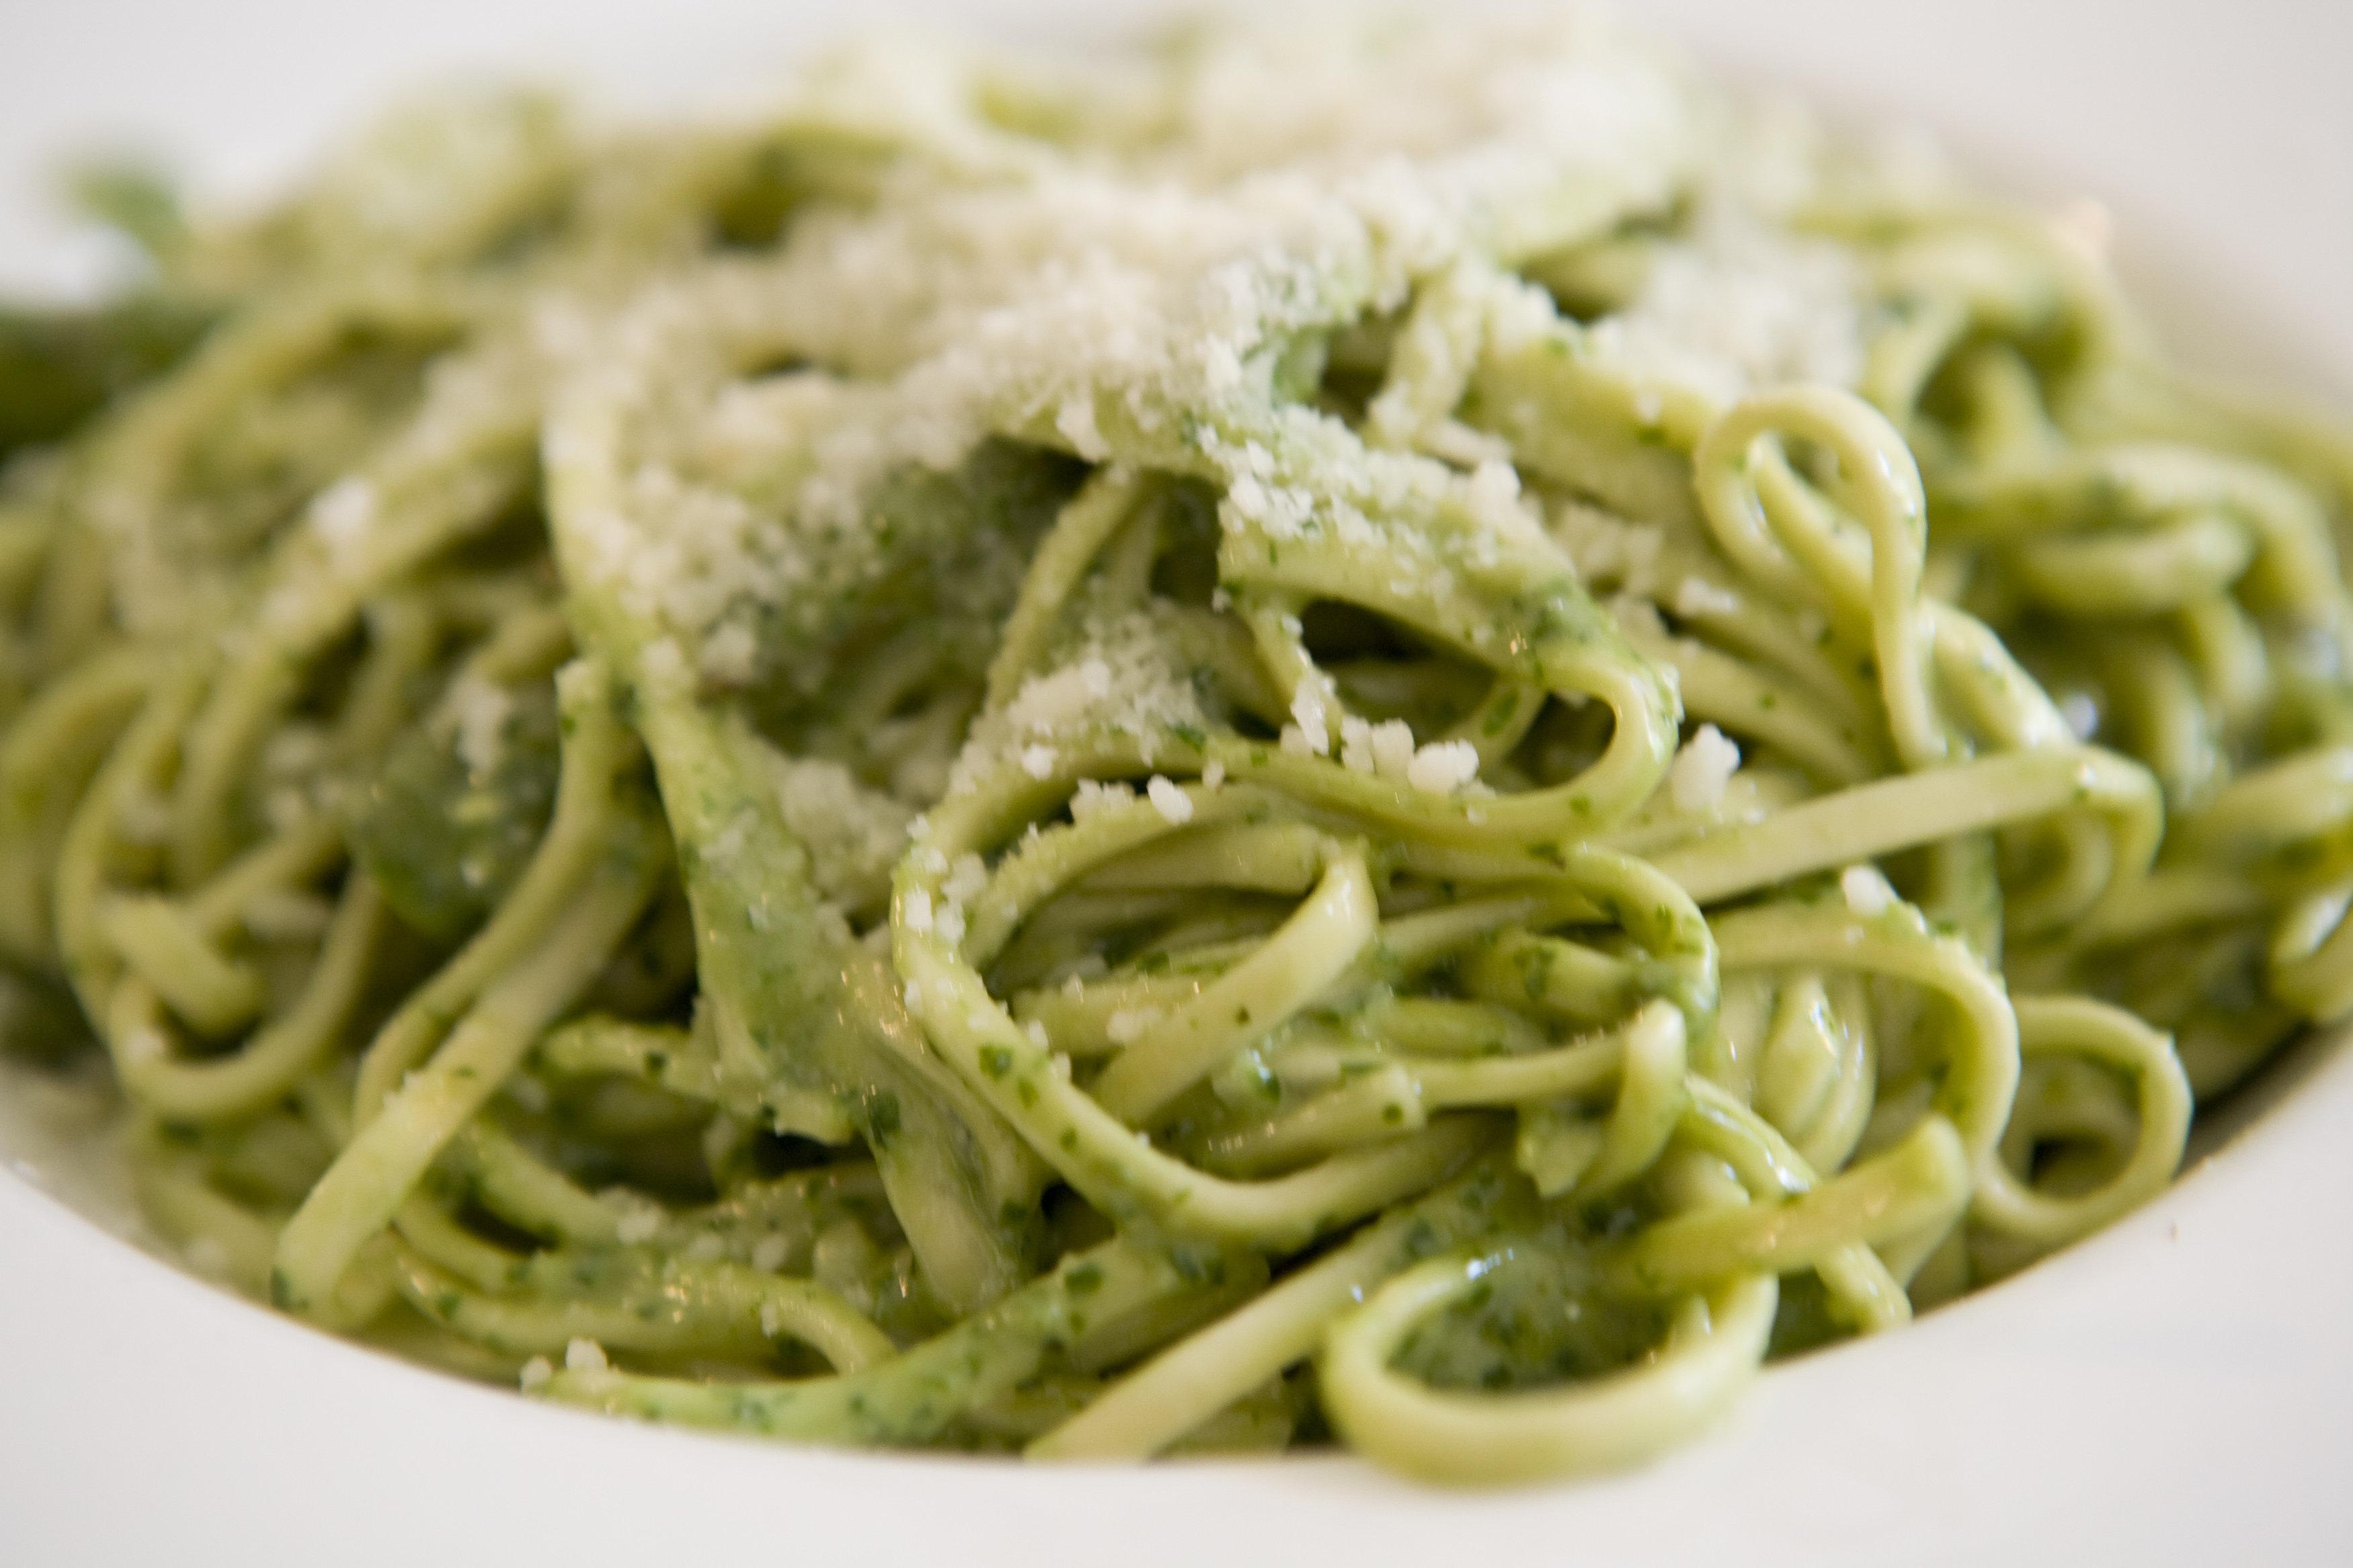 Pesto 'saltier than seawater', claim health campaigners